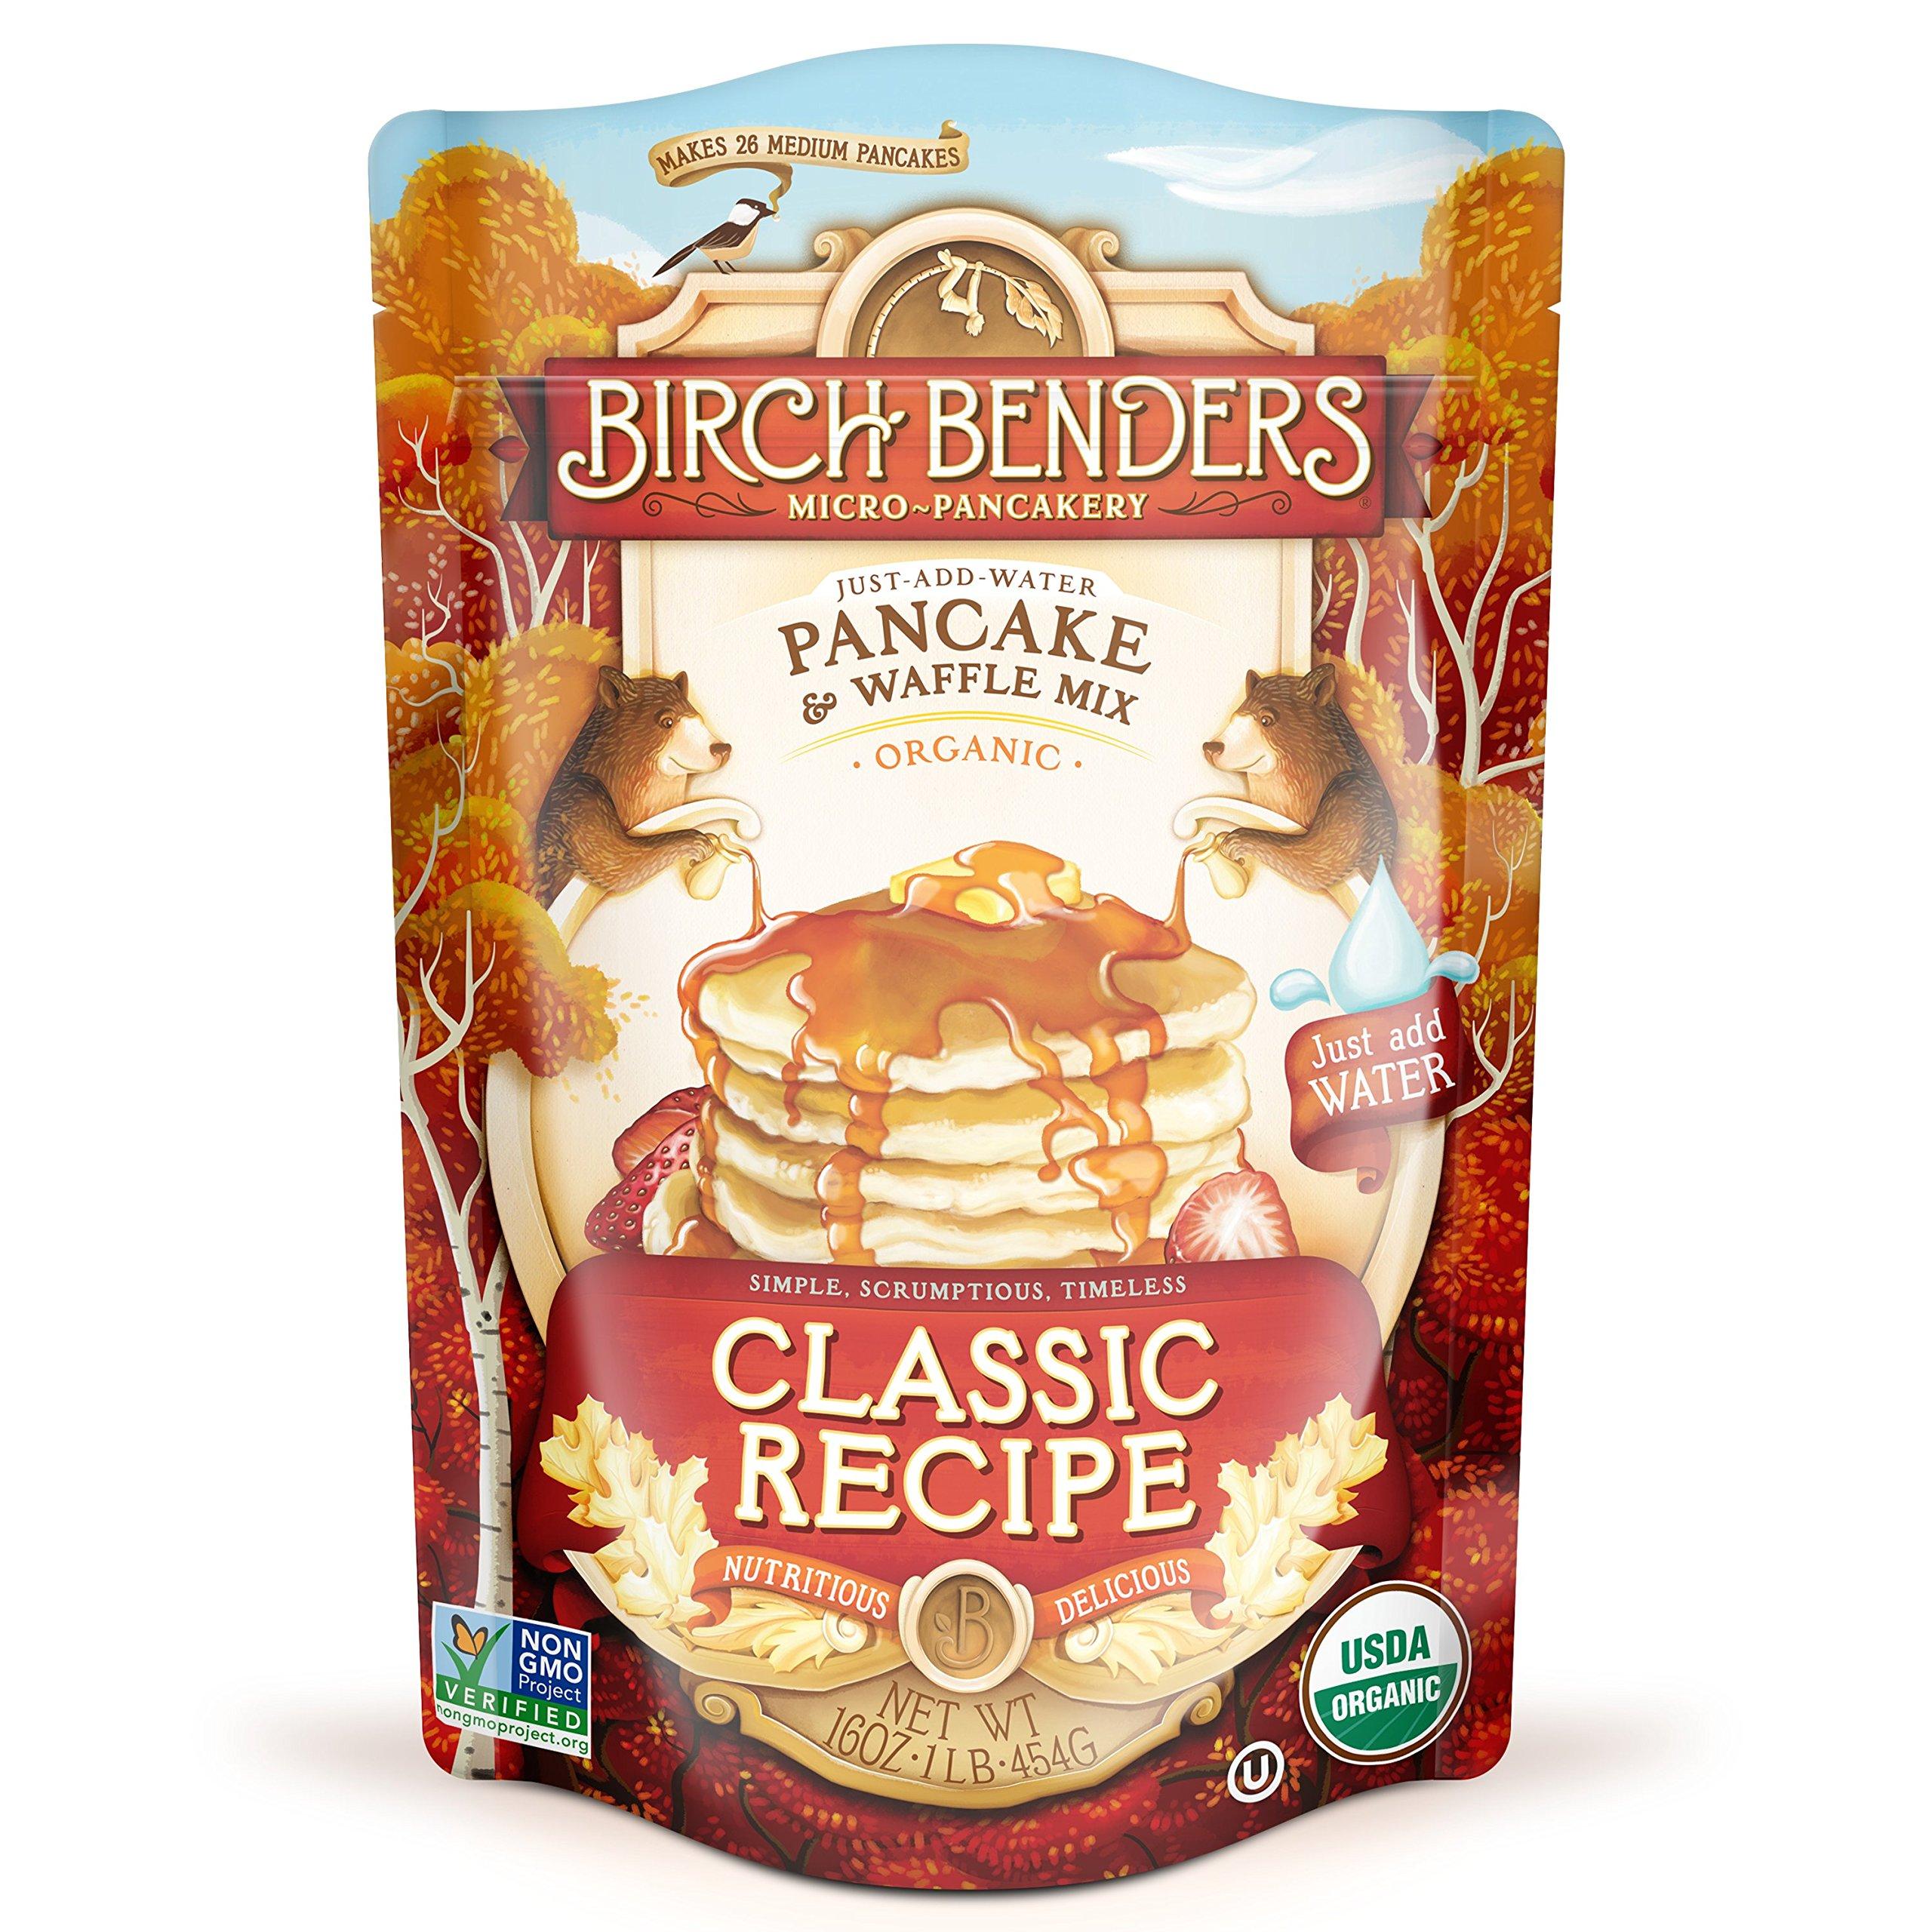 Organic Pancake and Waffle Mix, Classic Recipe by Birch Benders, Whole Grain, Non-GMO, 16oz